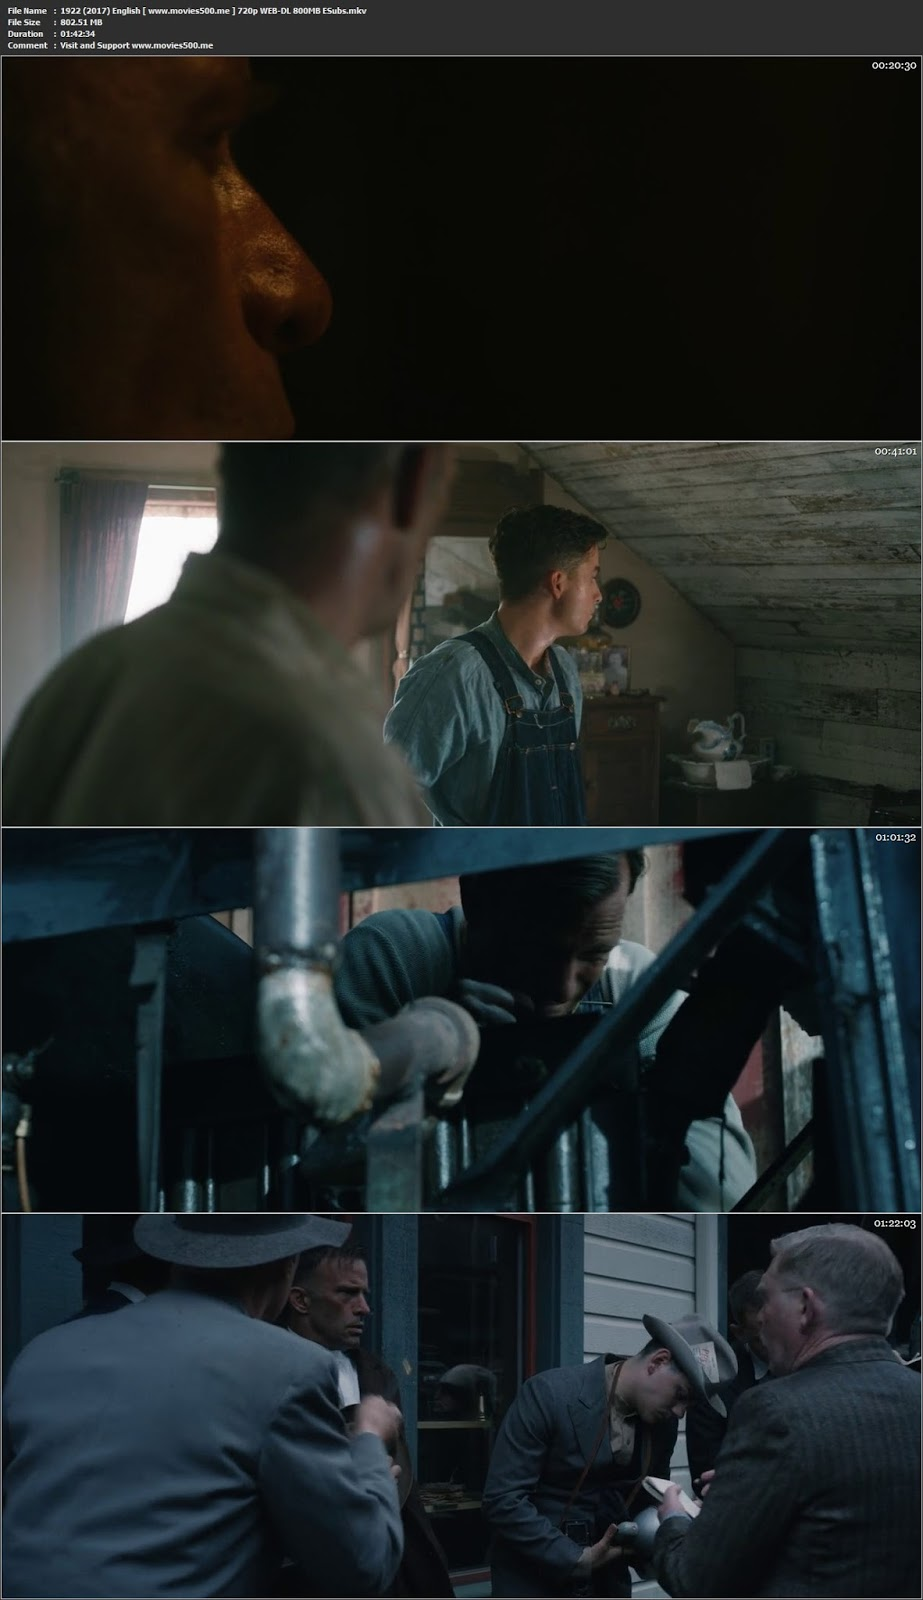 1922 (2017) English Full Movie WEB DL 720p ESubs at gencoalumni.info